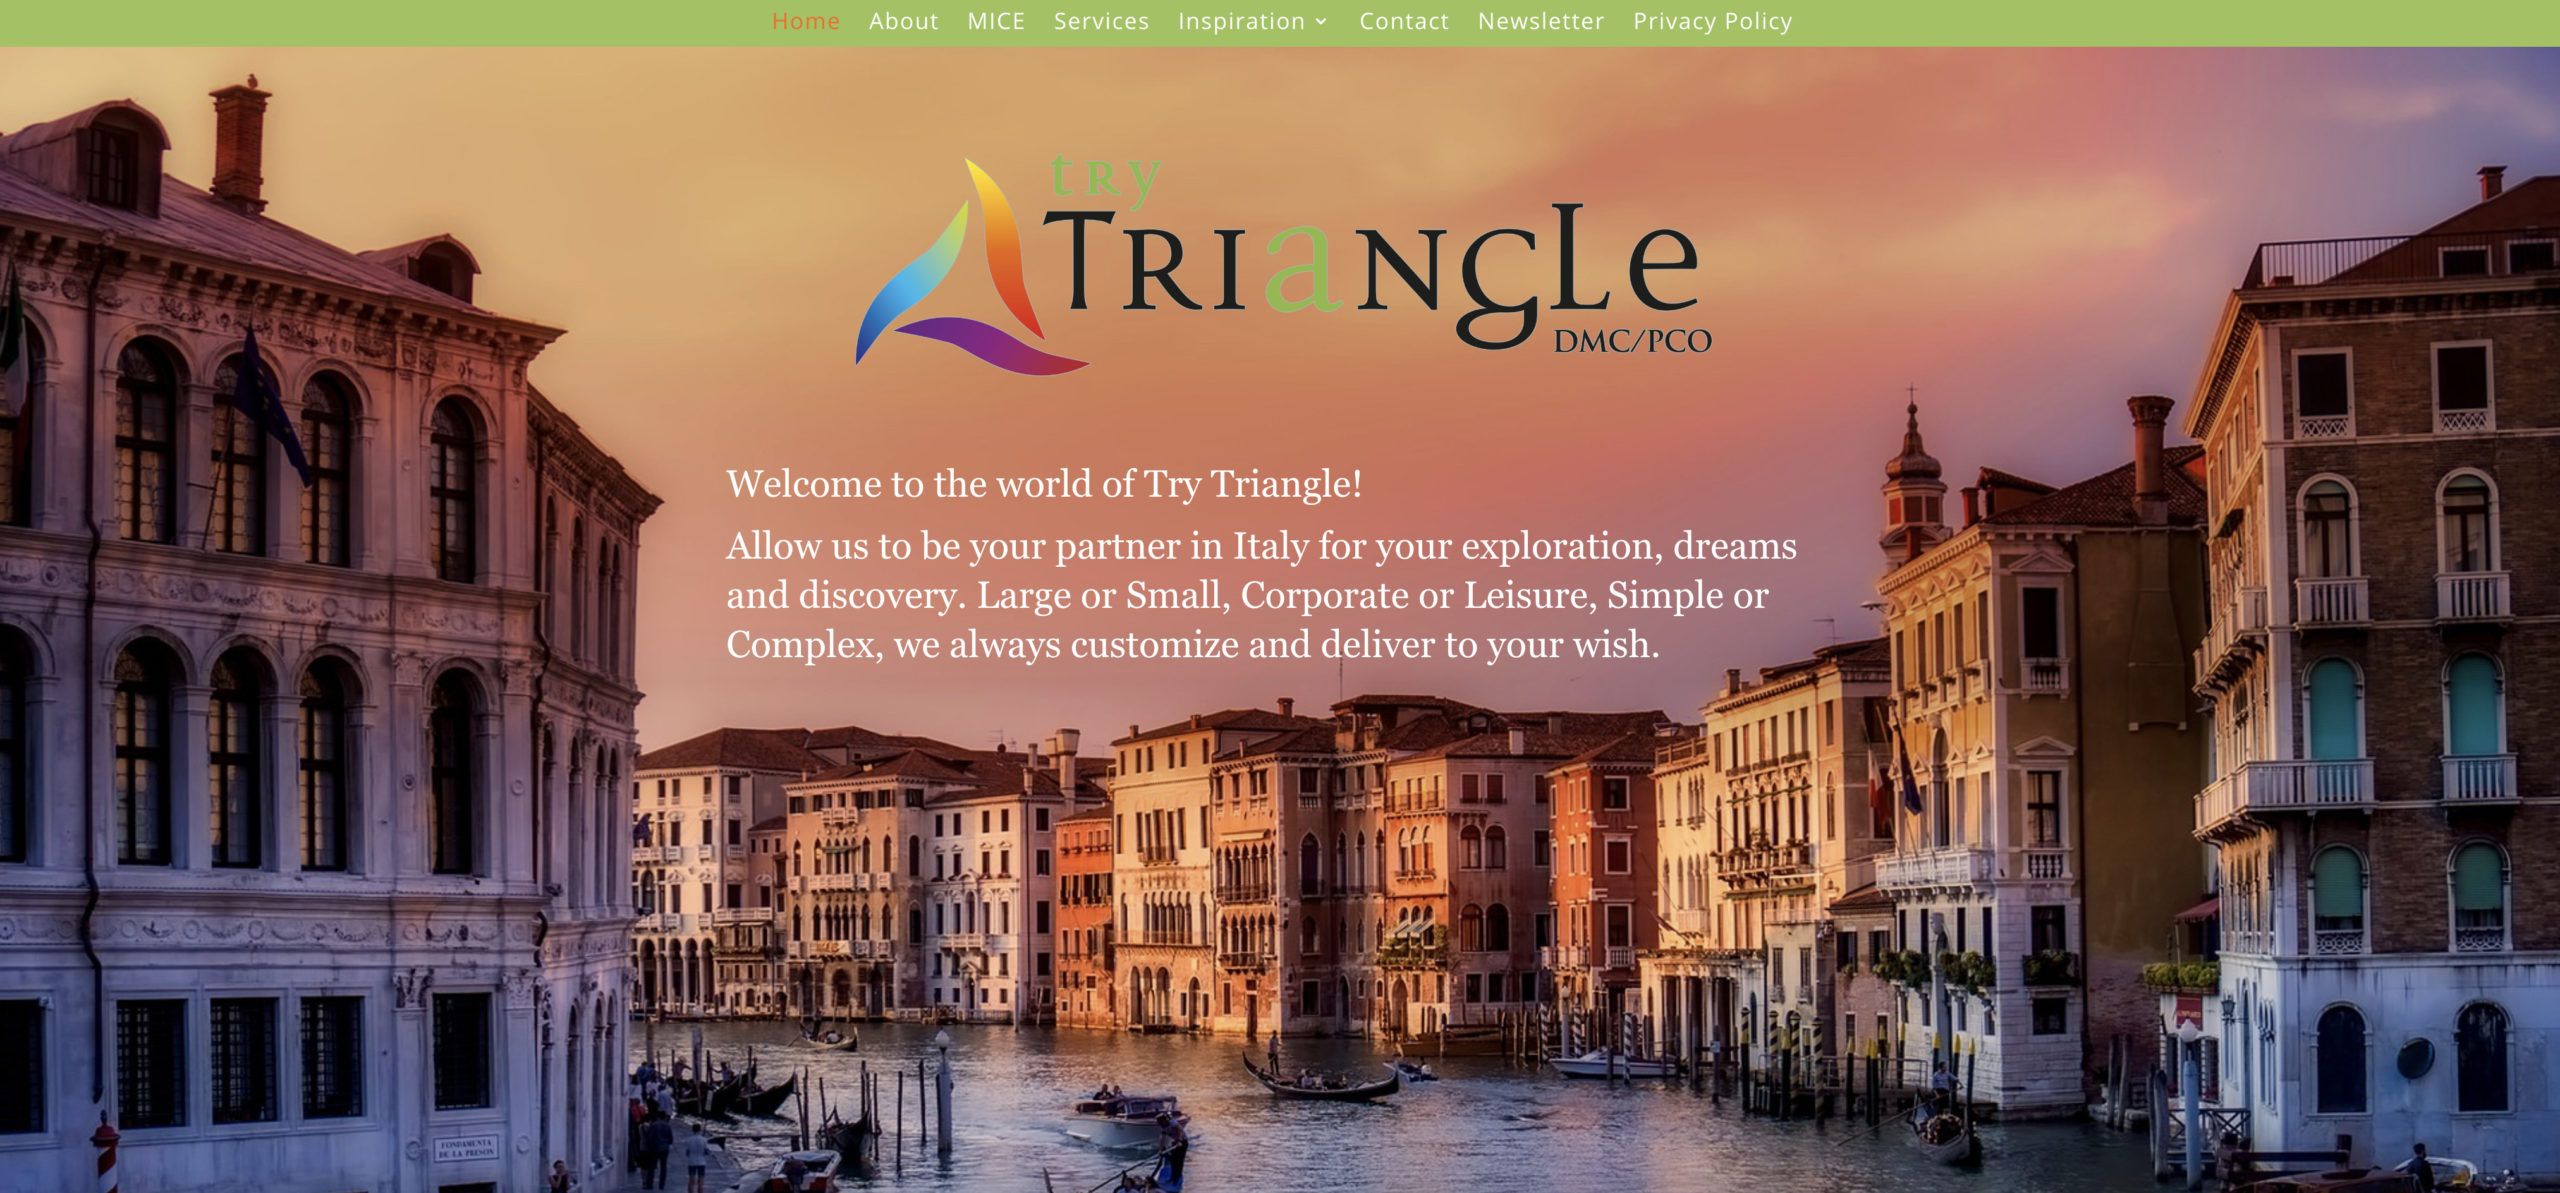 Try Triangle DMC